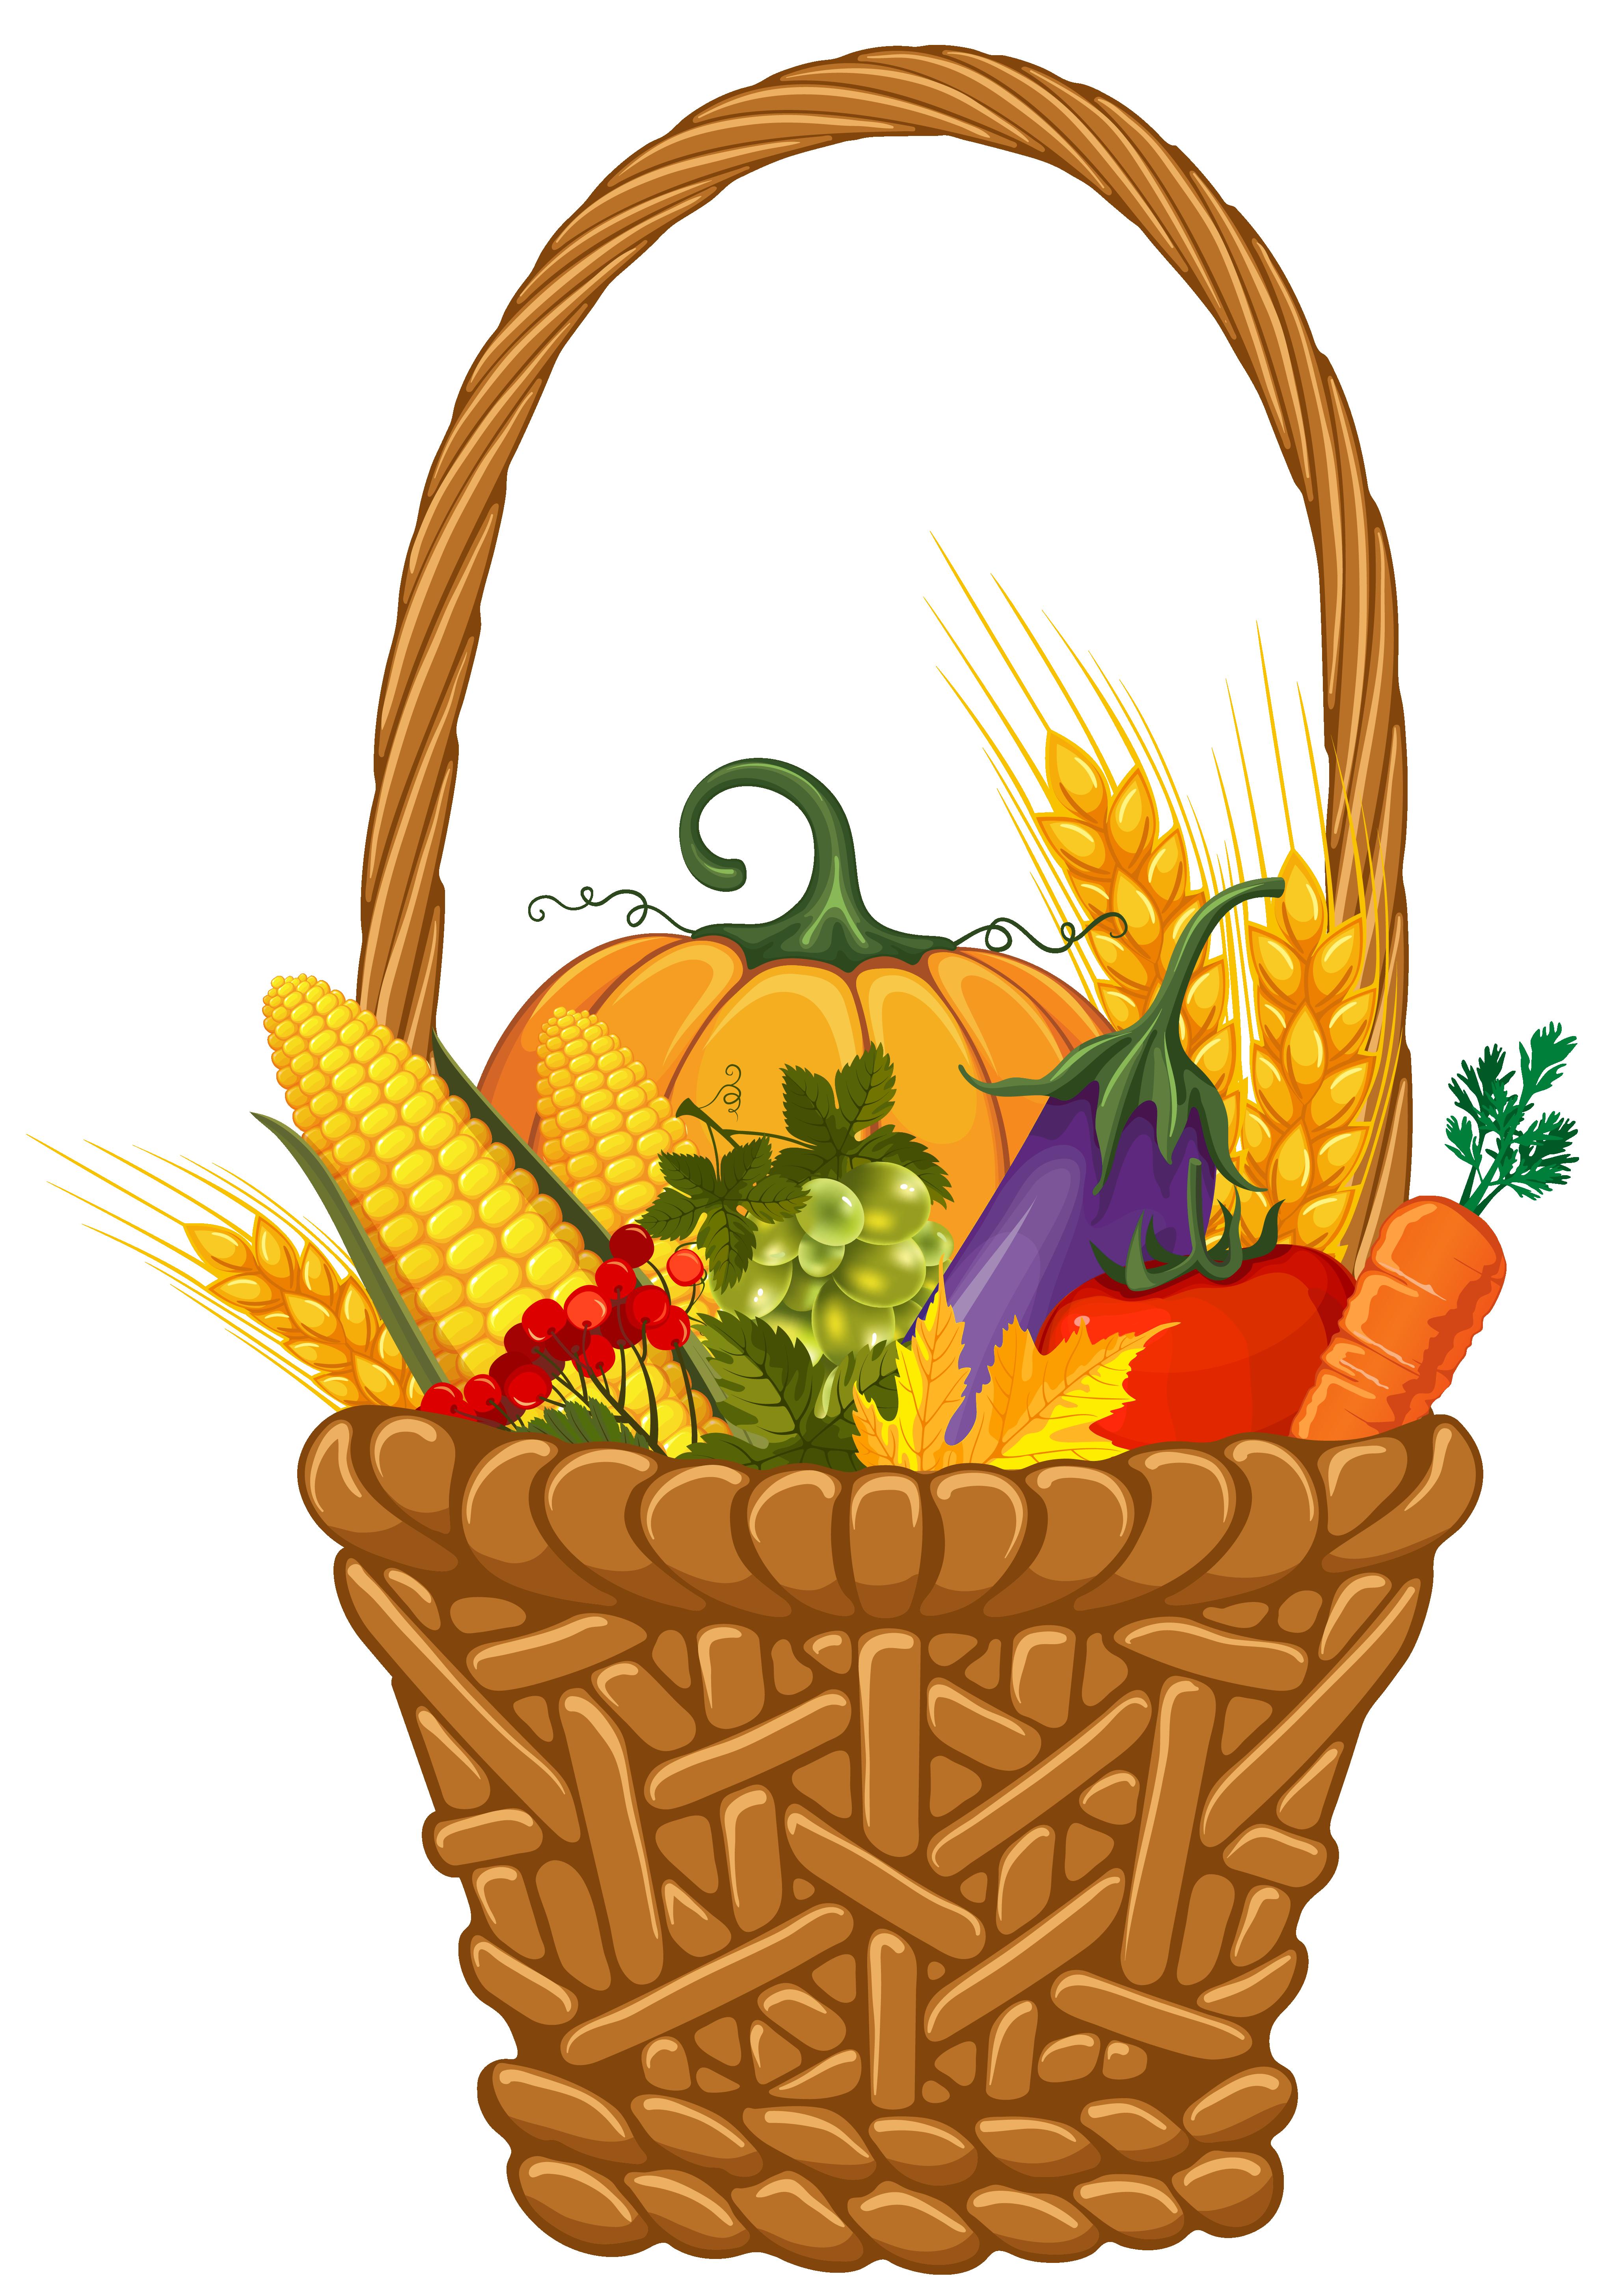 Fall Harvest Basket PNG Clipart Image.